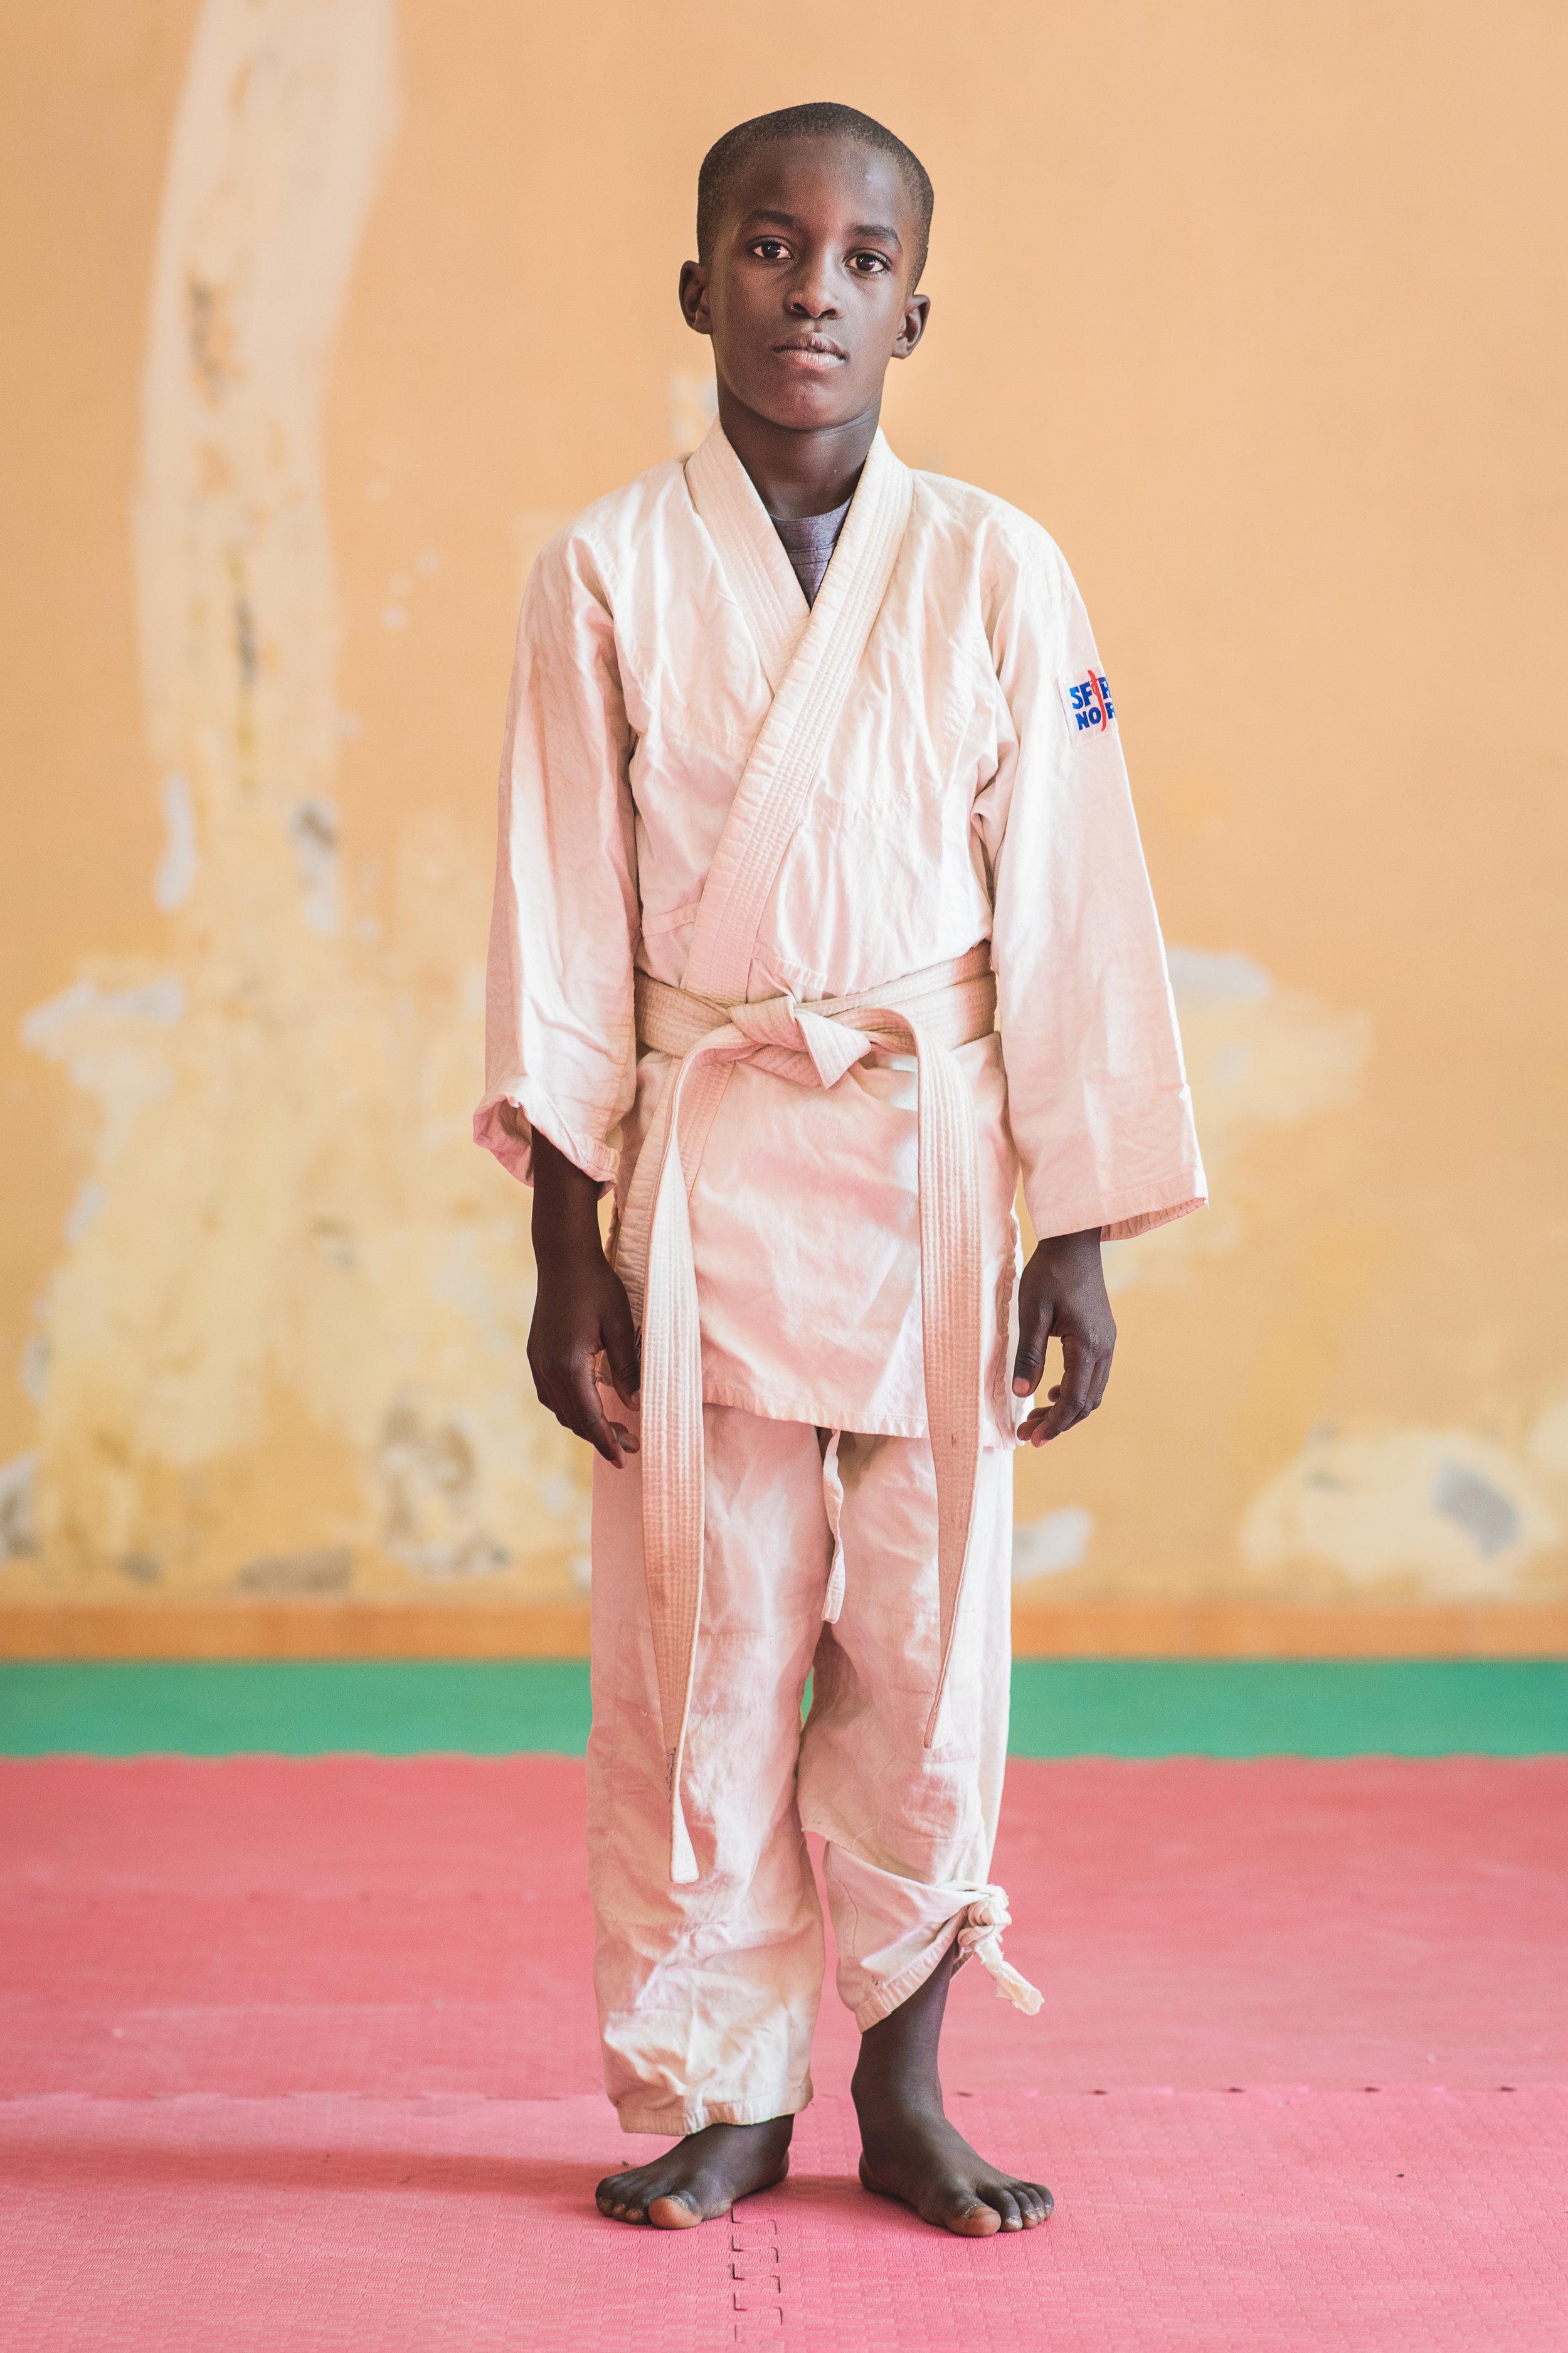 Judokas-9730_40x60.jpg